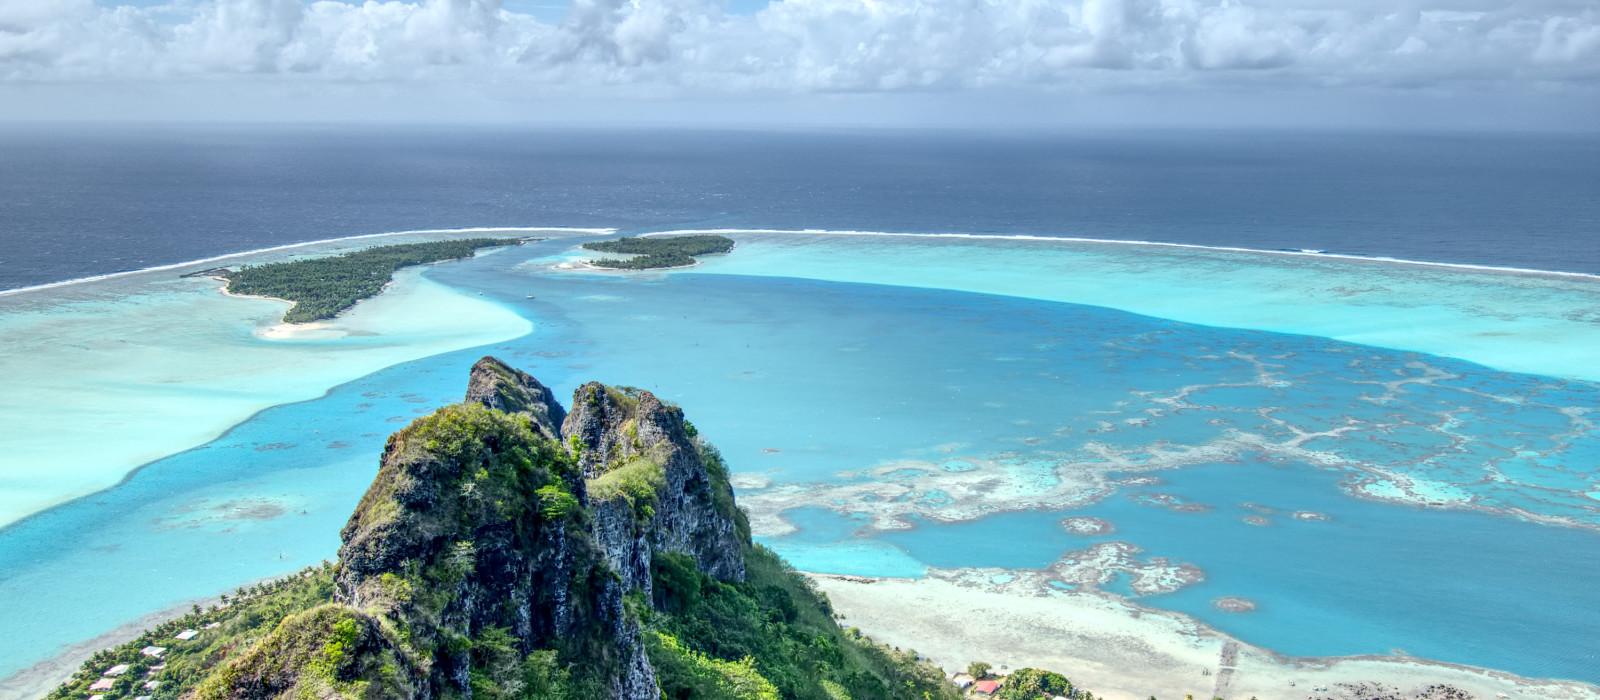 Destination Maupiti French Polynesia